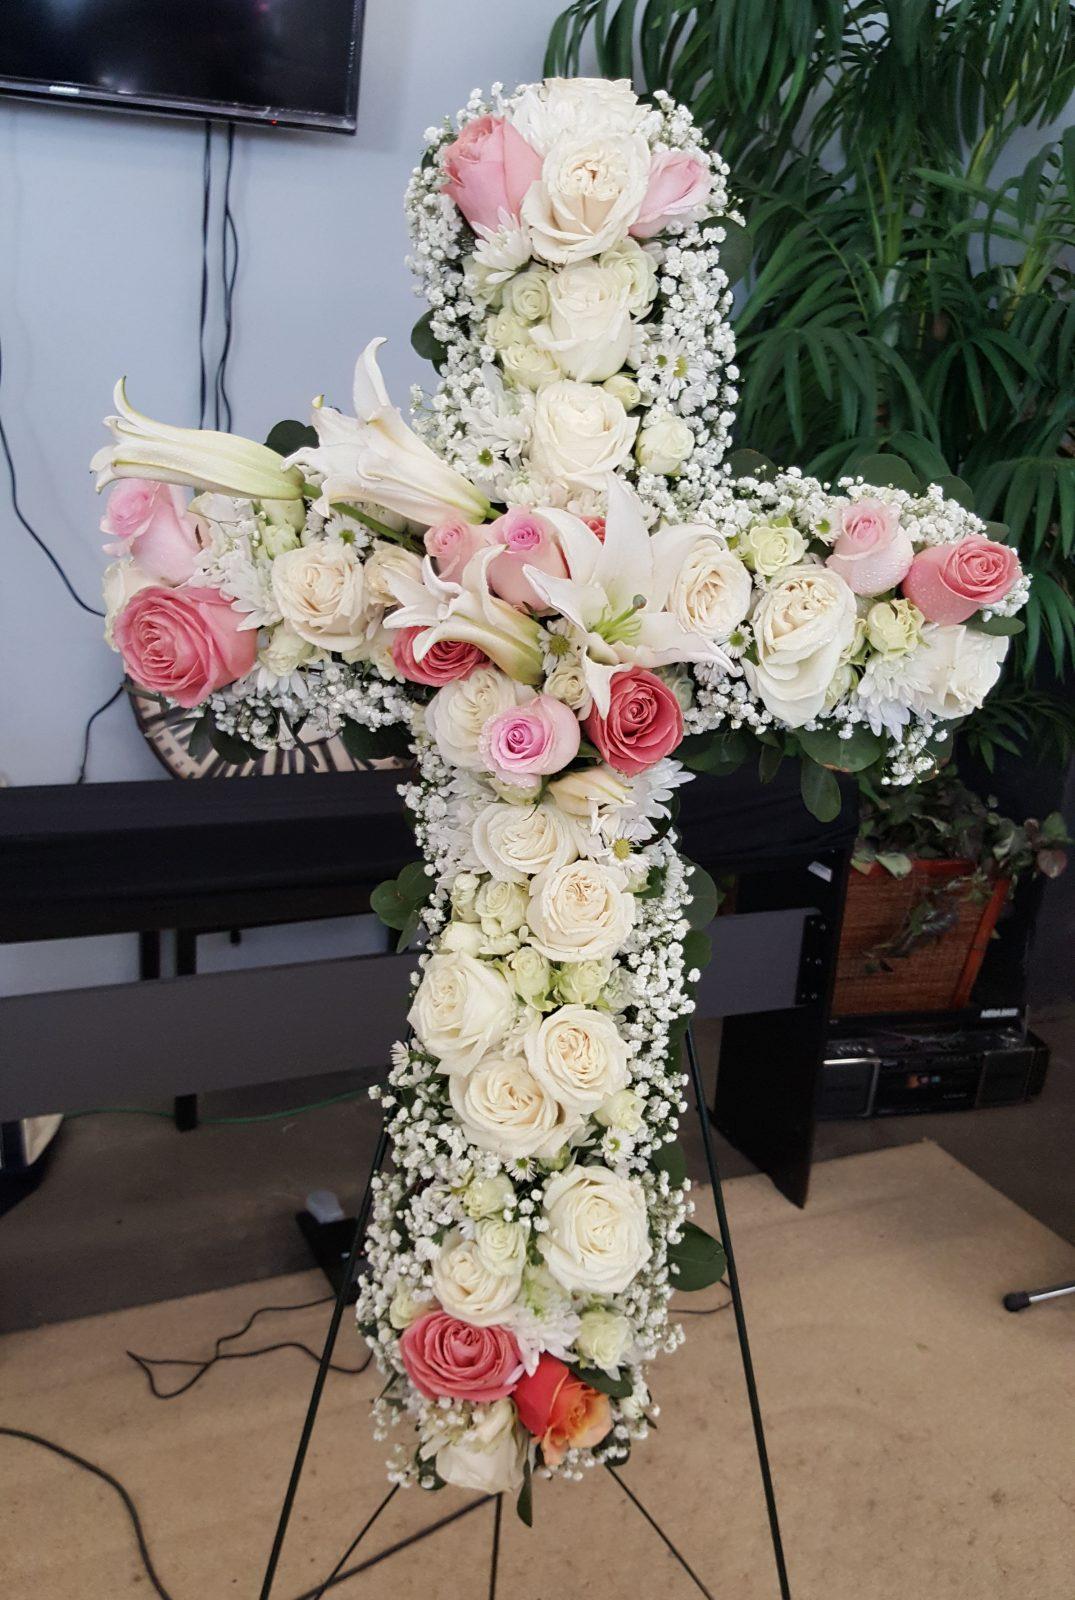 Funeral wreathcross 11 sharon floral funeral wreathcross 11 izmirmasajfo Image collections